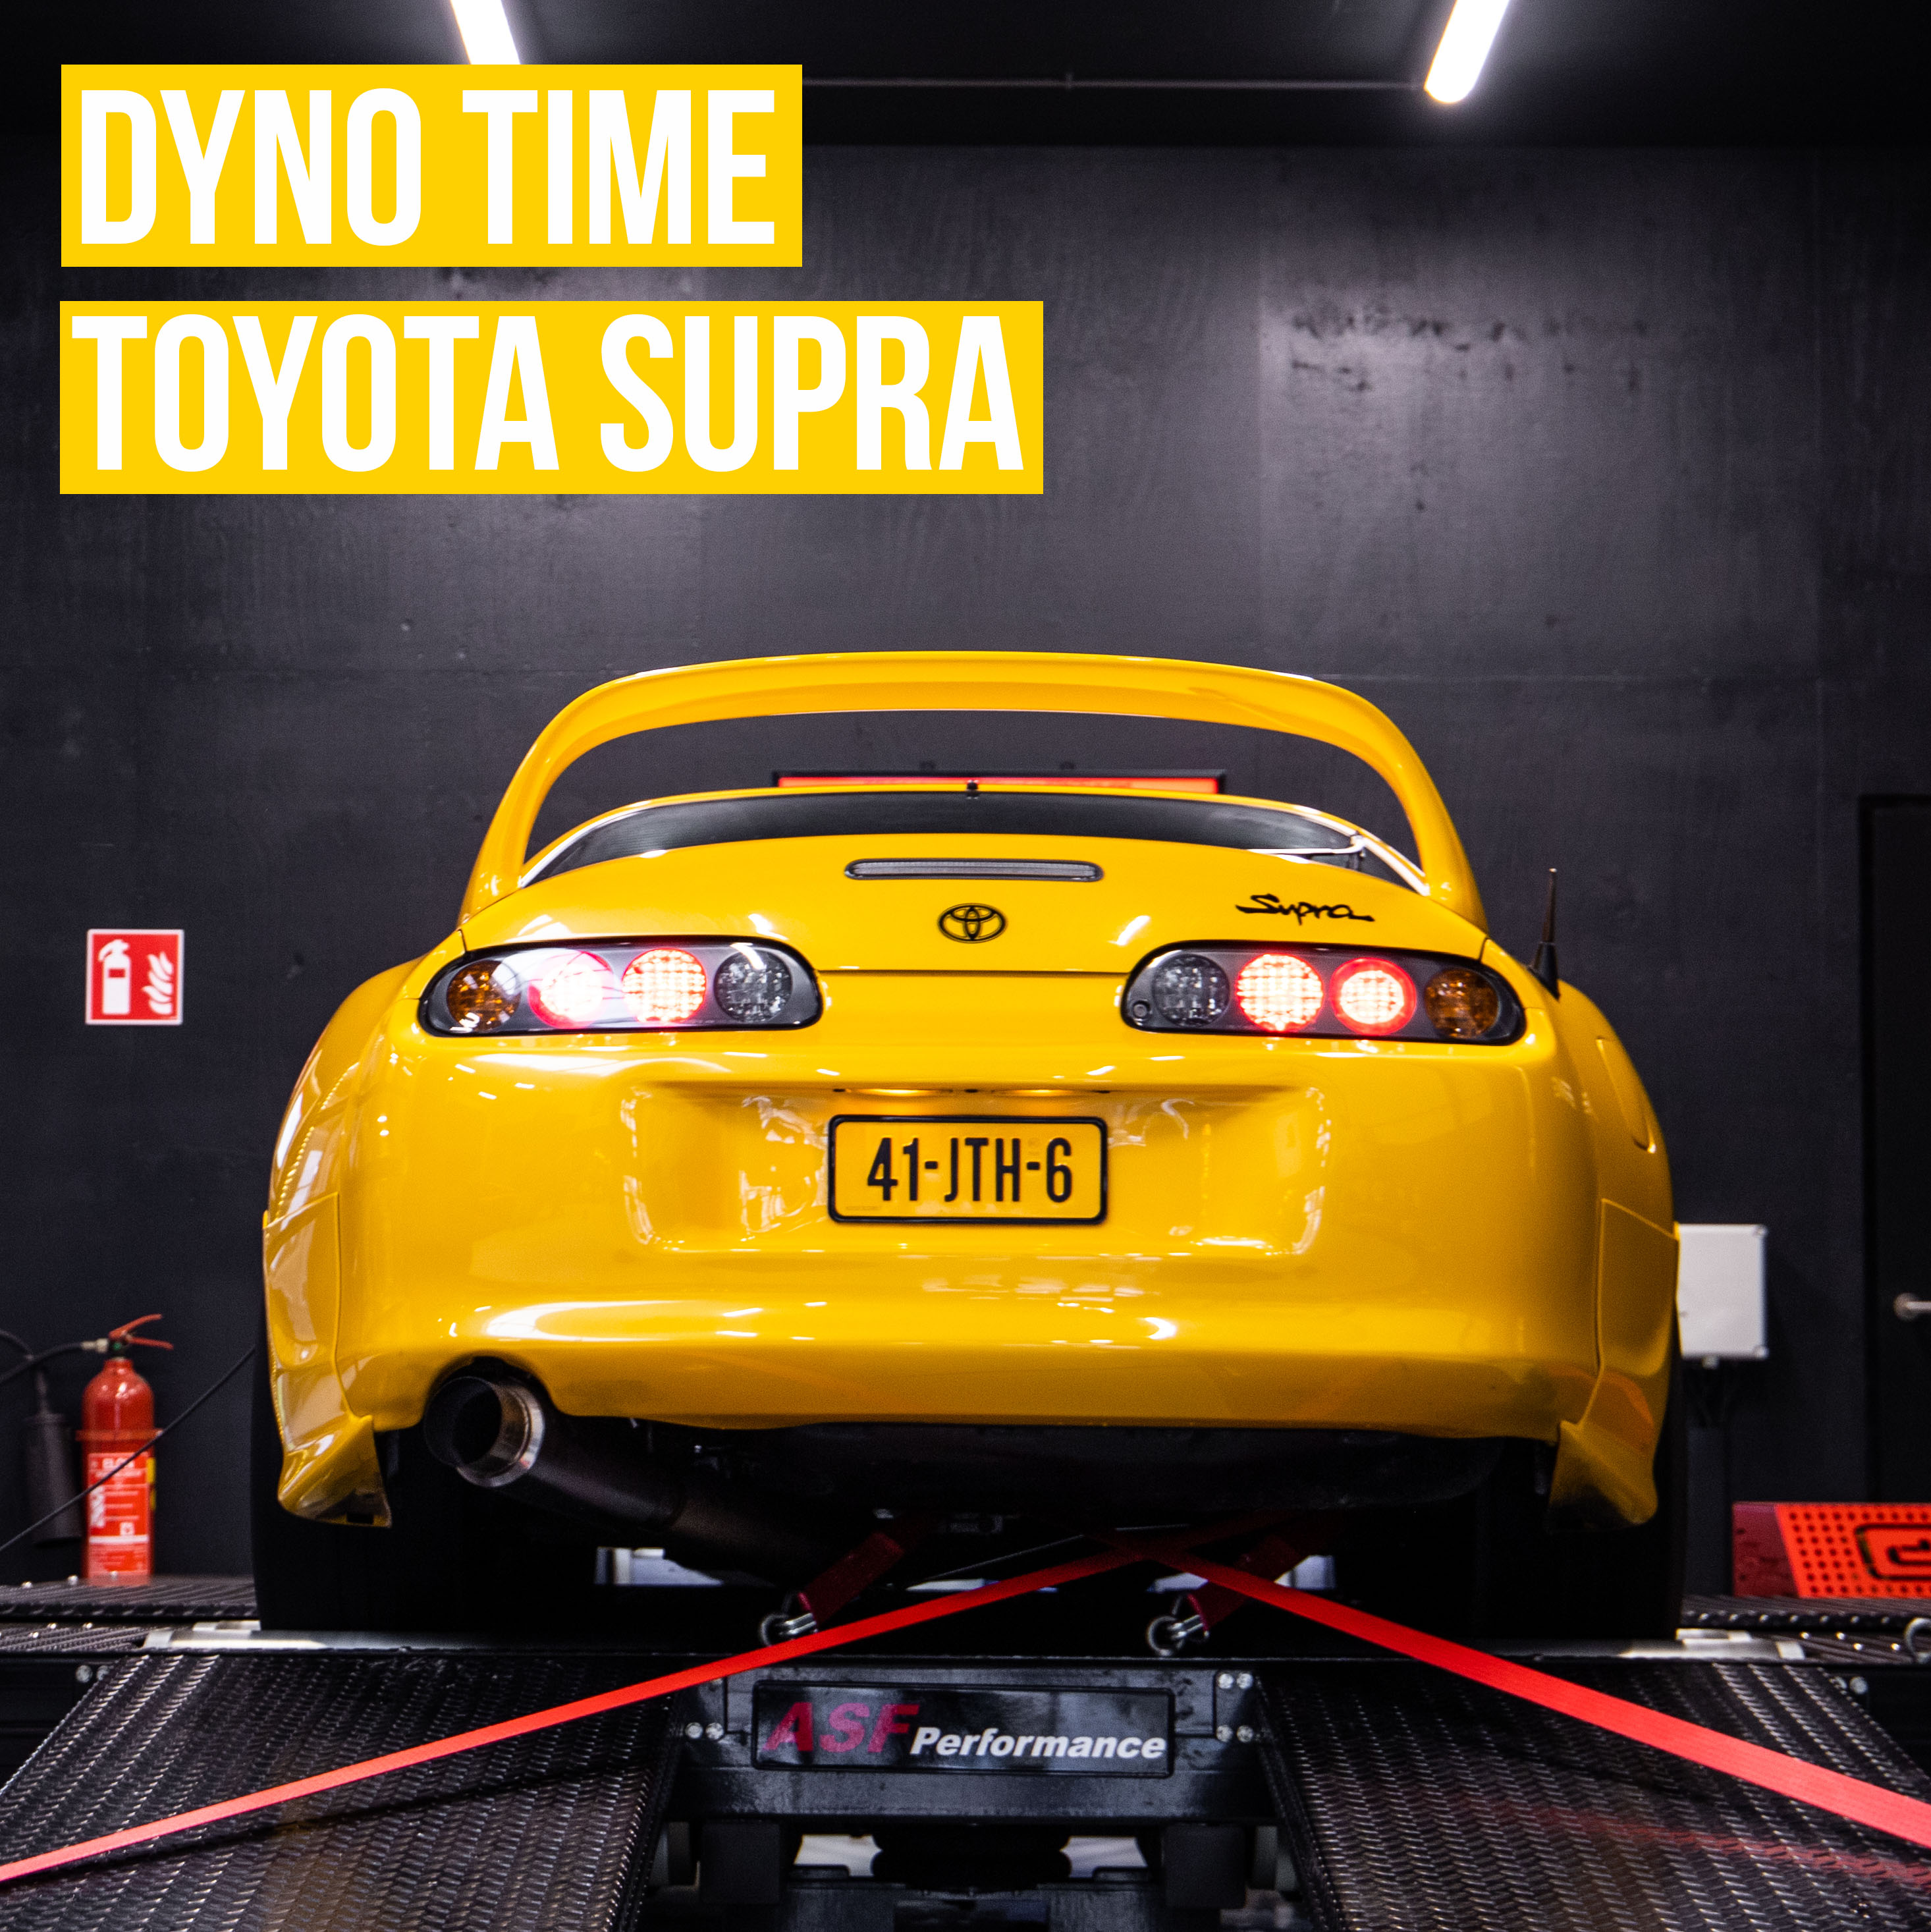 Dyno Time Toyota Supra